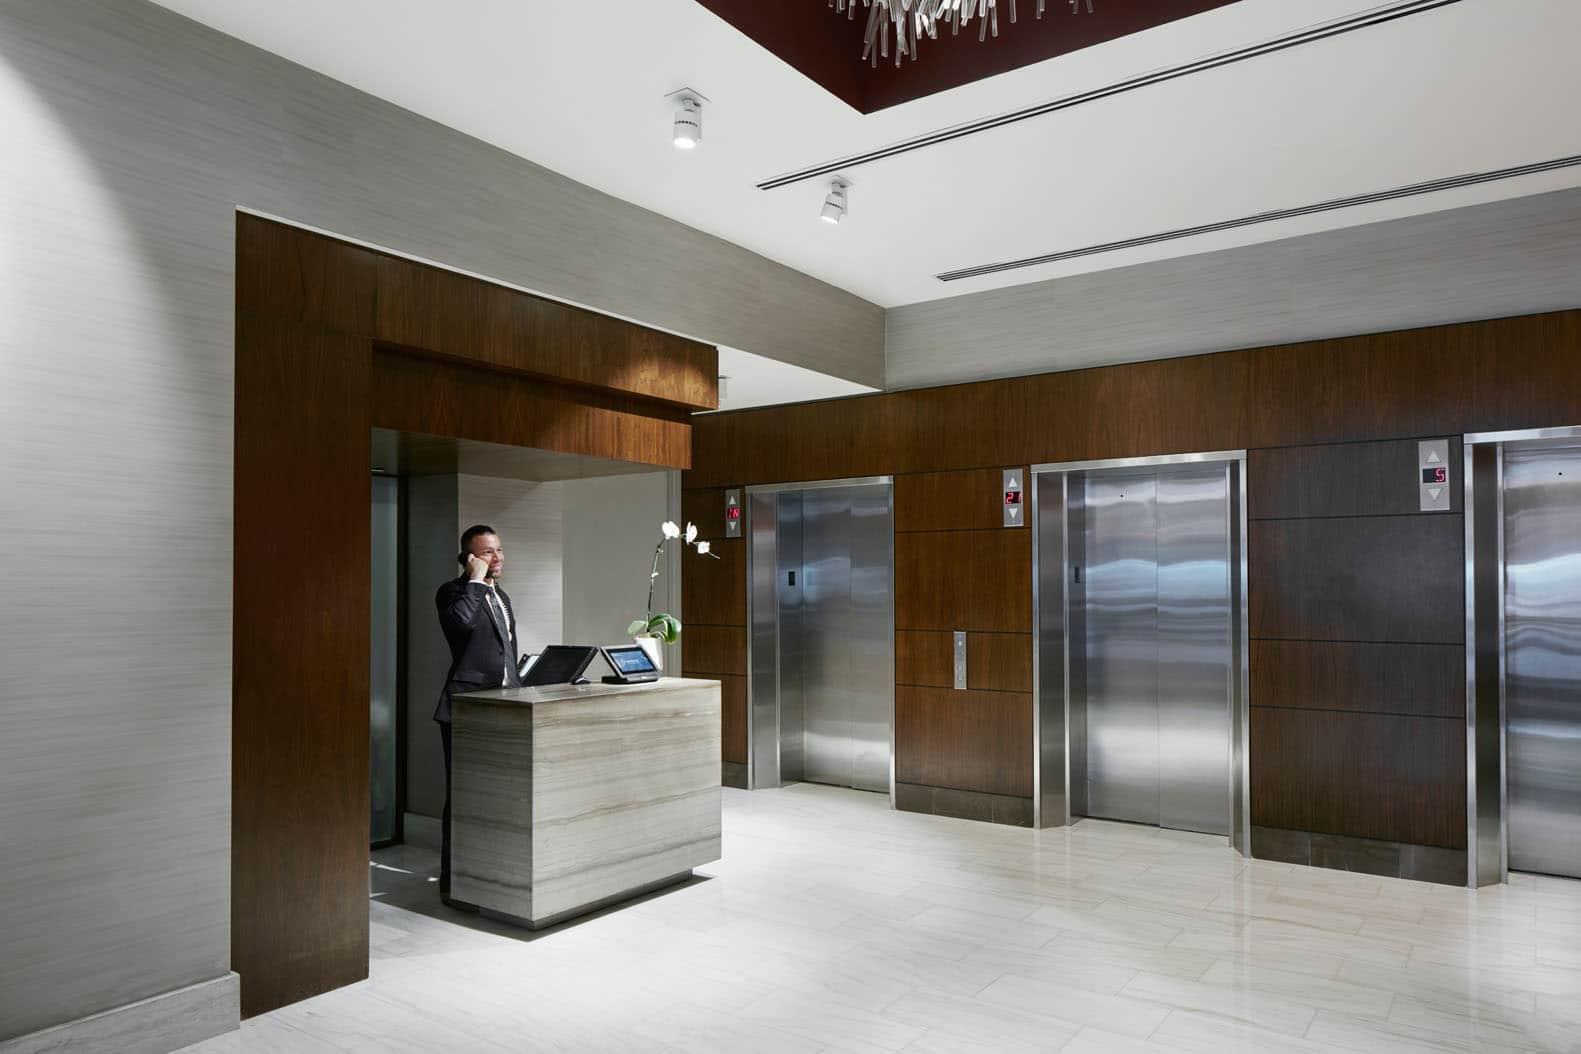 club quarters hotel grand central ny hotelsbyday rh hotelsbyday com club quarters grand central nyc club quarters grand central tripadvisor